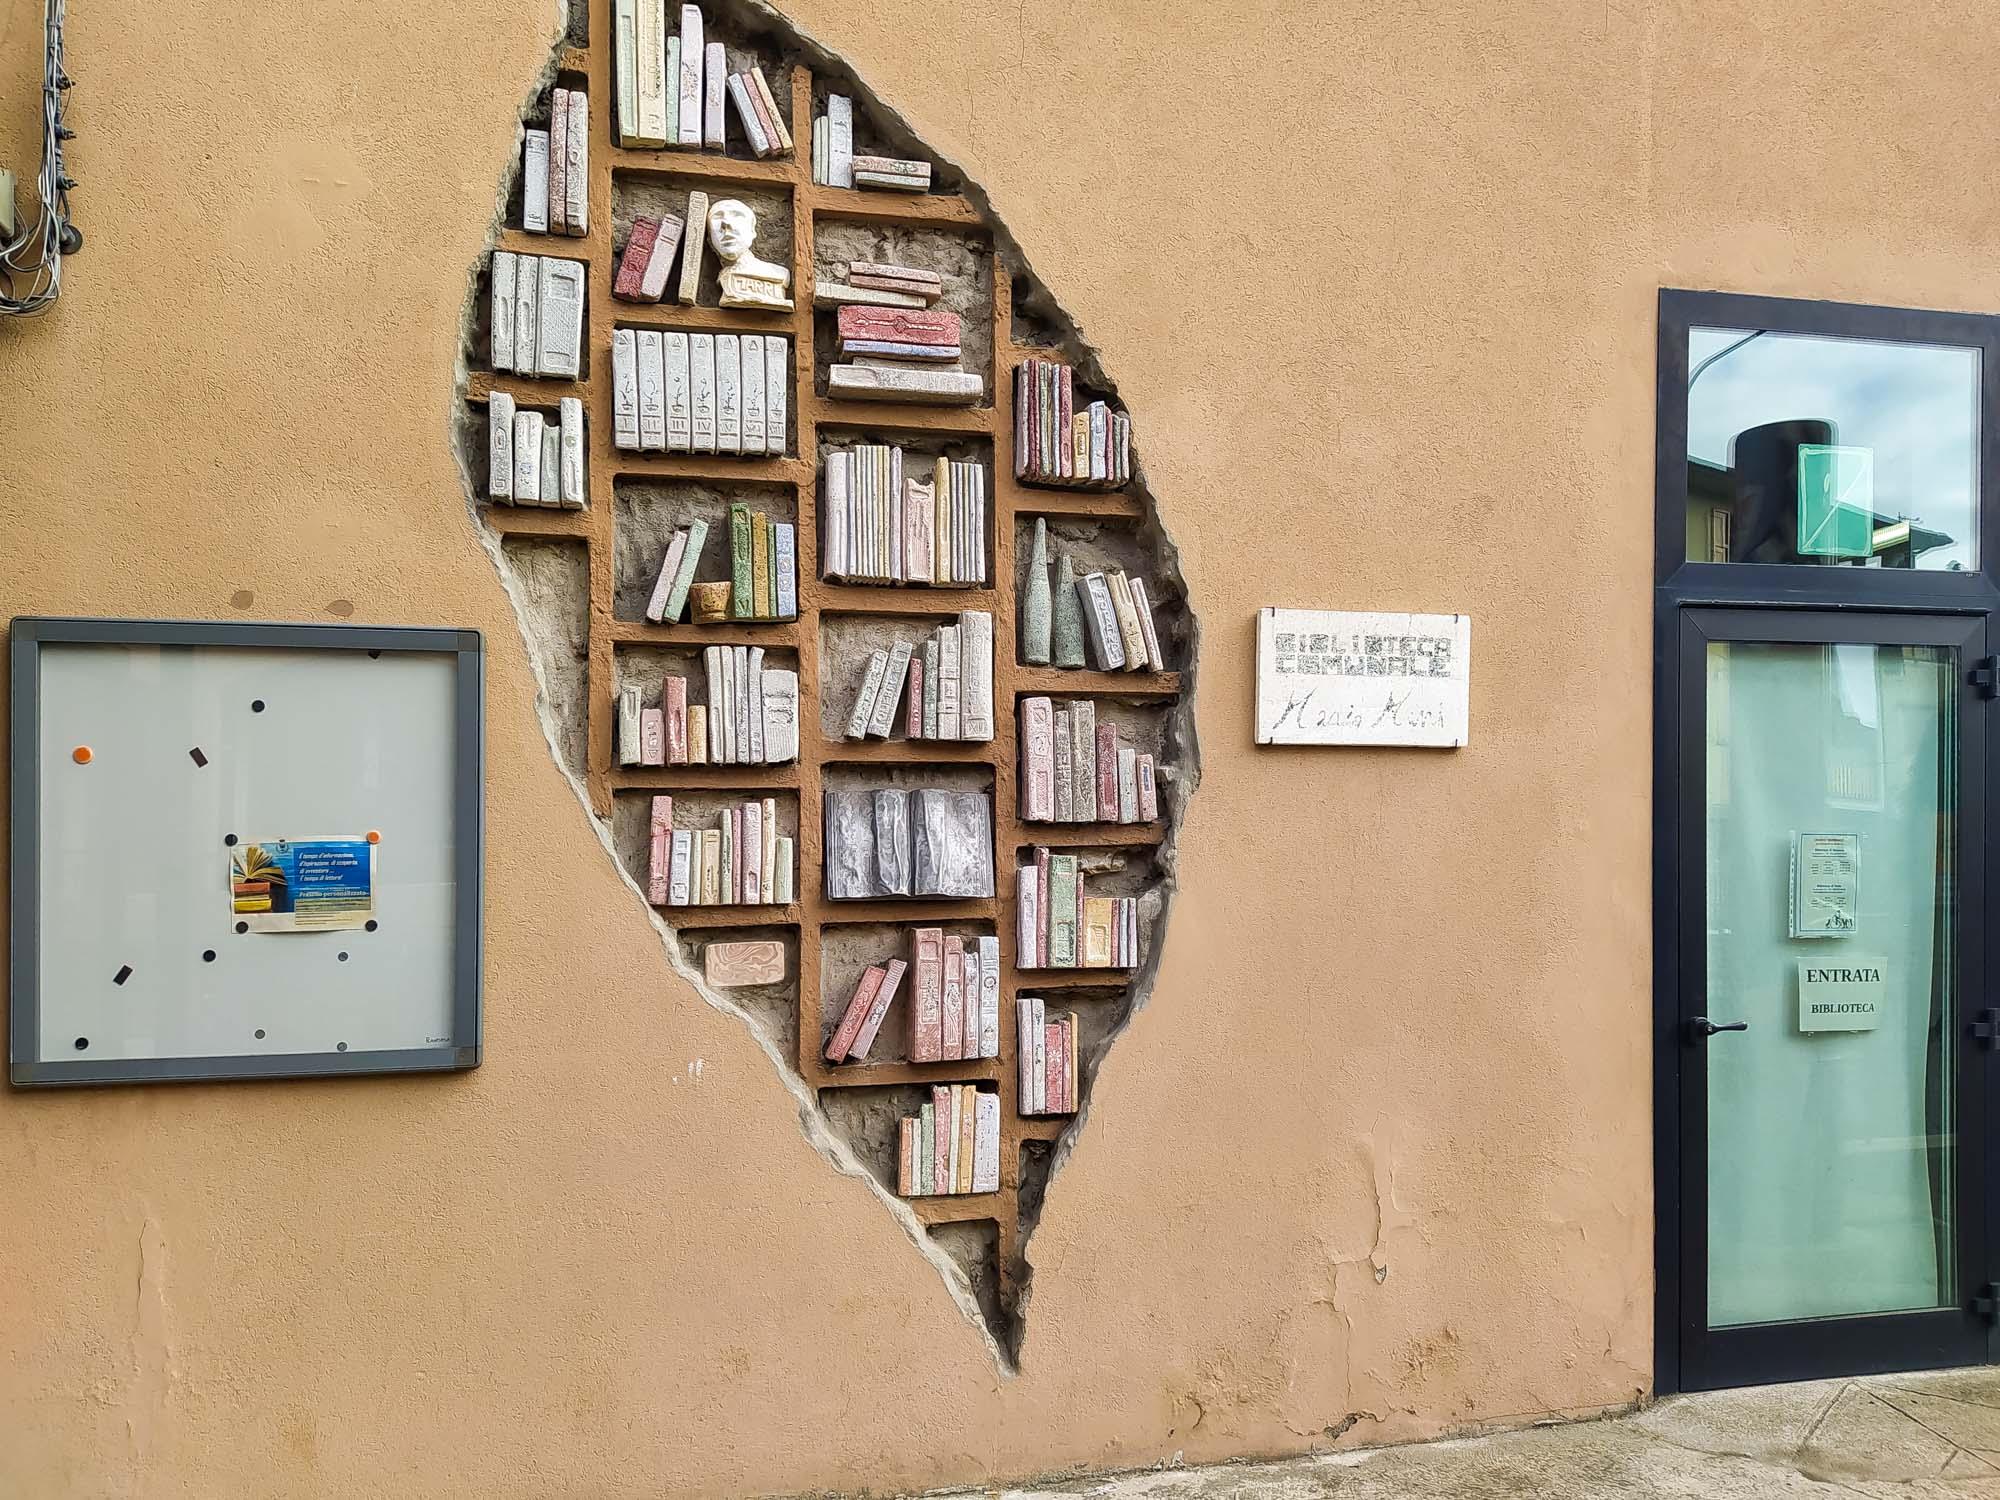 Biblioteca comunale di Monzuno